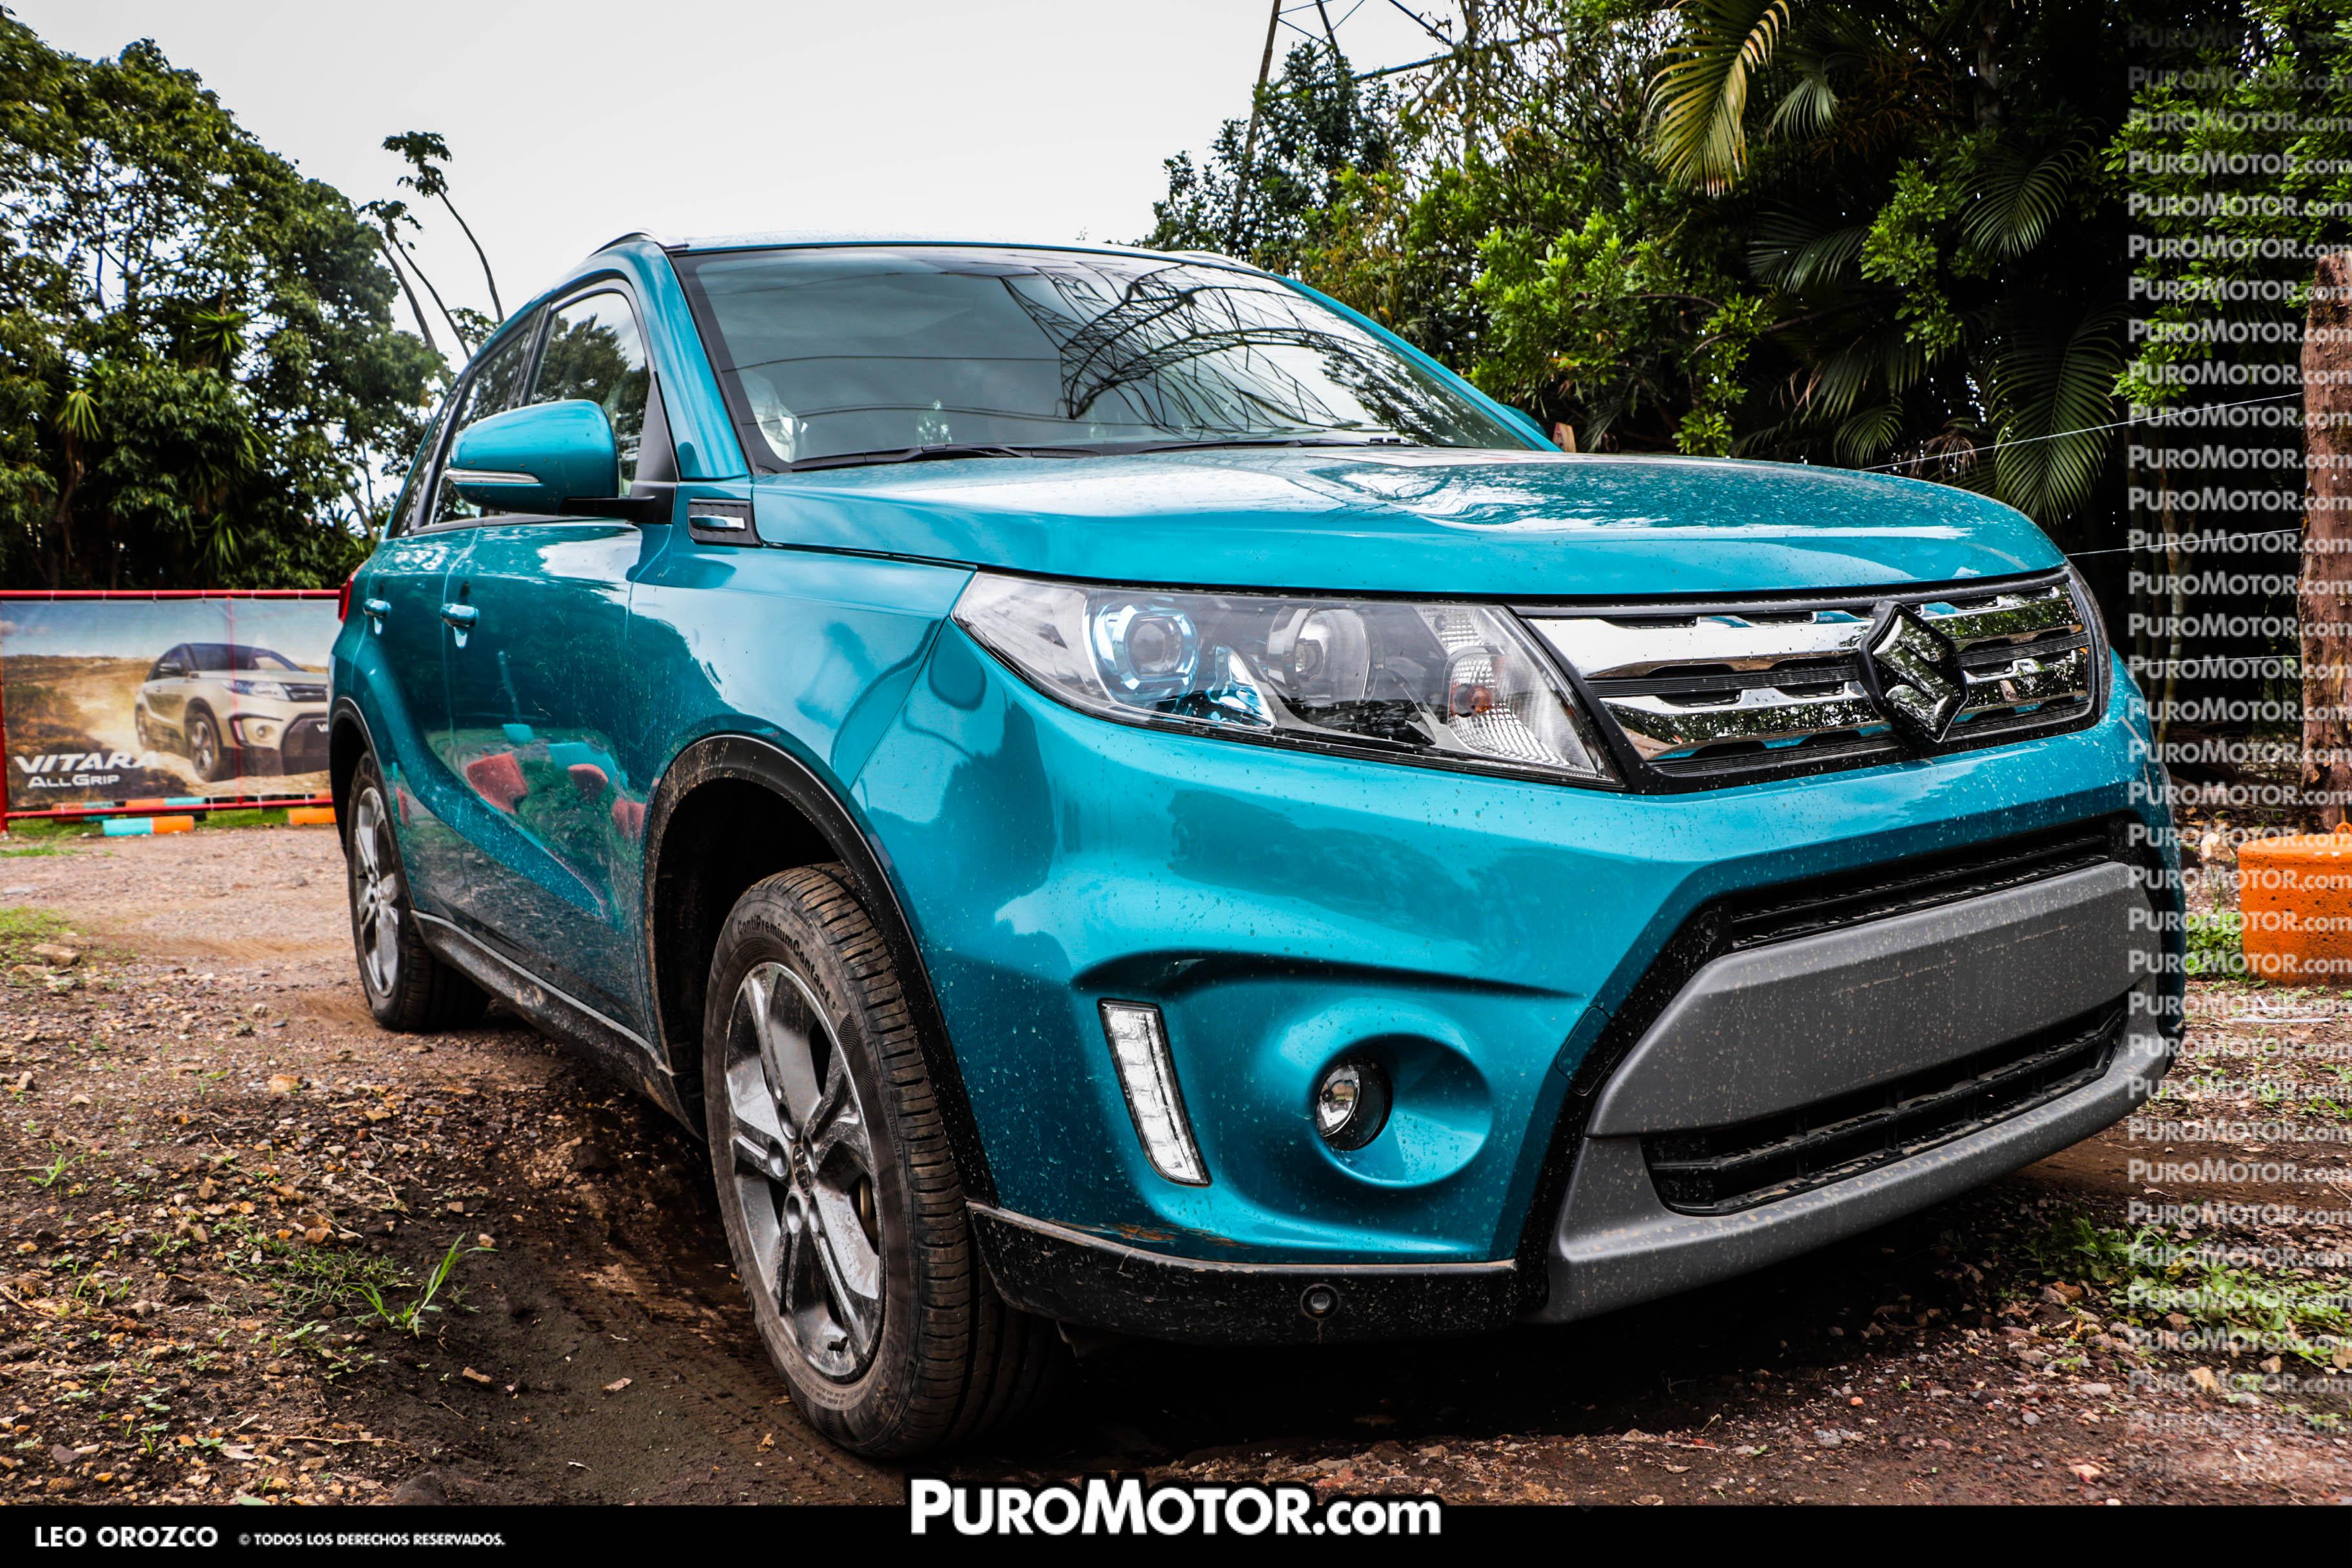 ©Leo Orozco I Puro Motor (23 of 37)